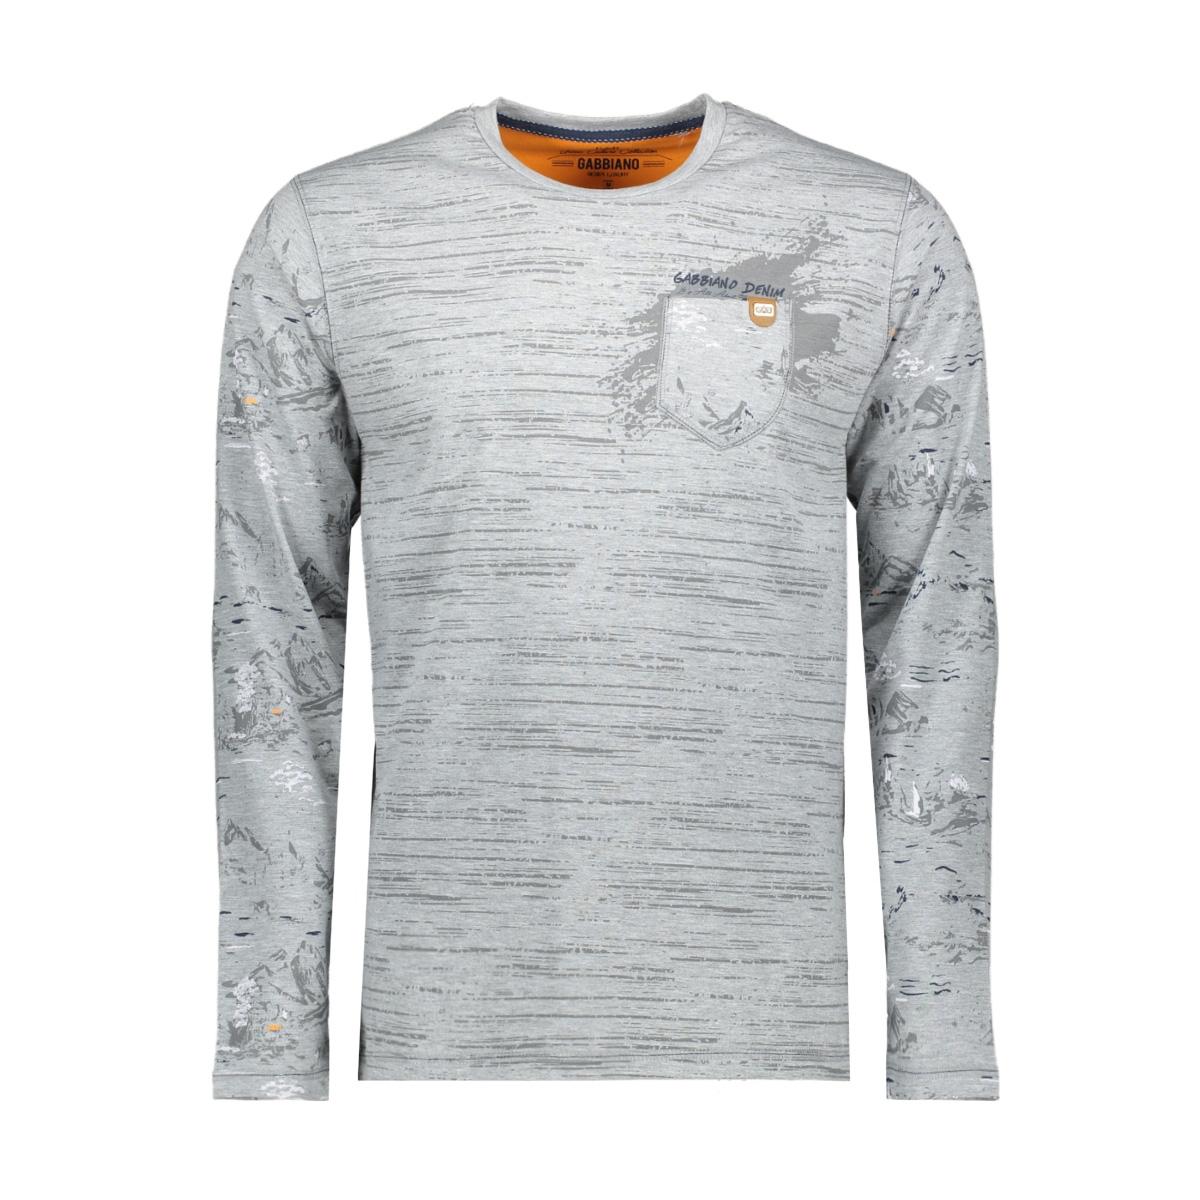 13847 gabbiano t-shirt grey